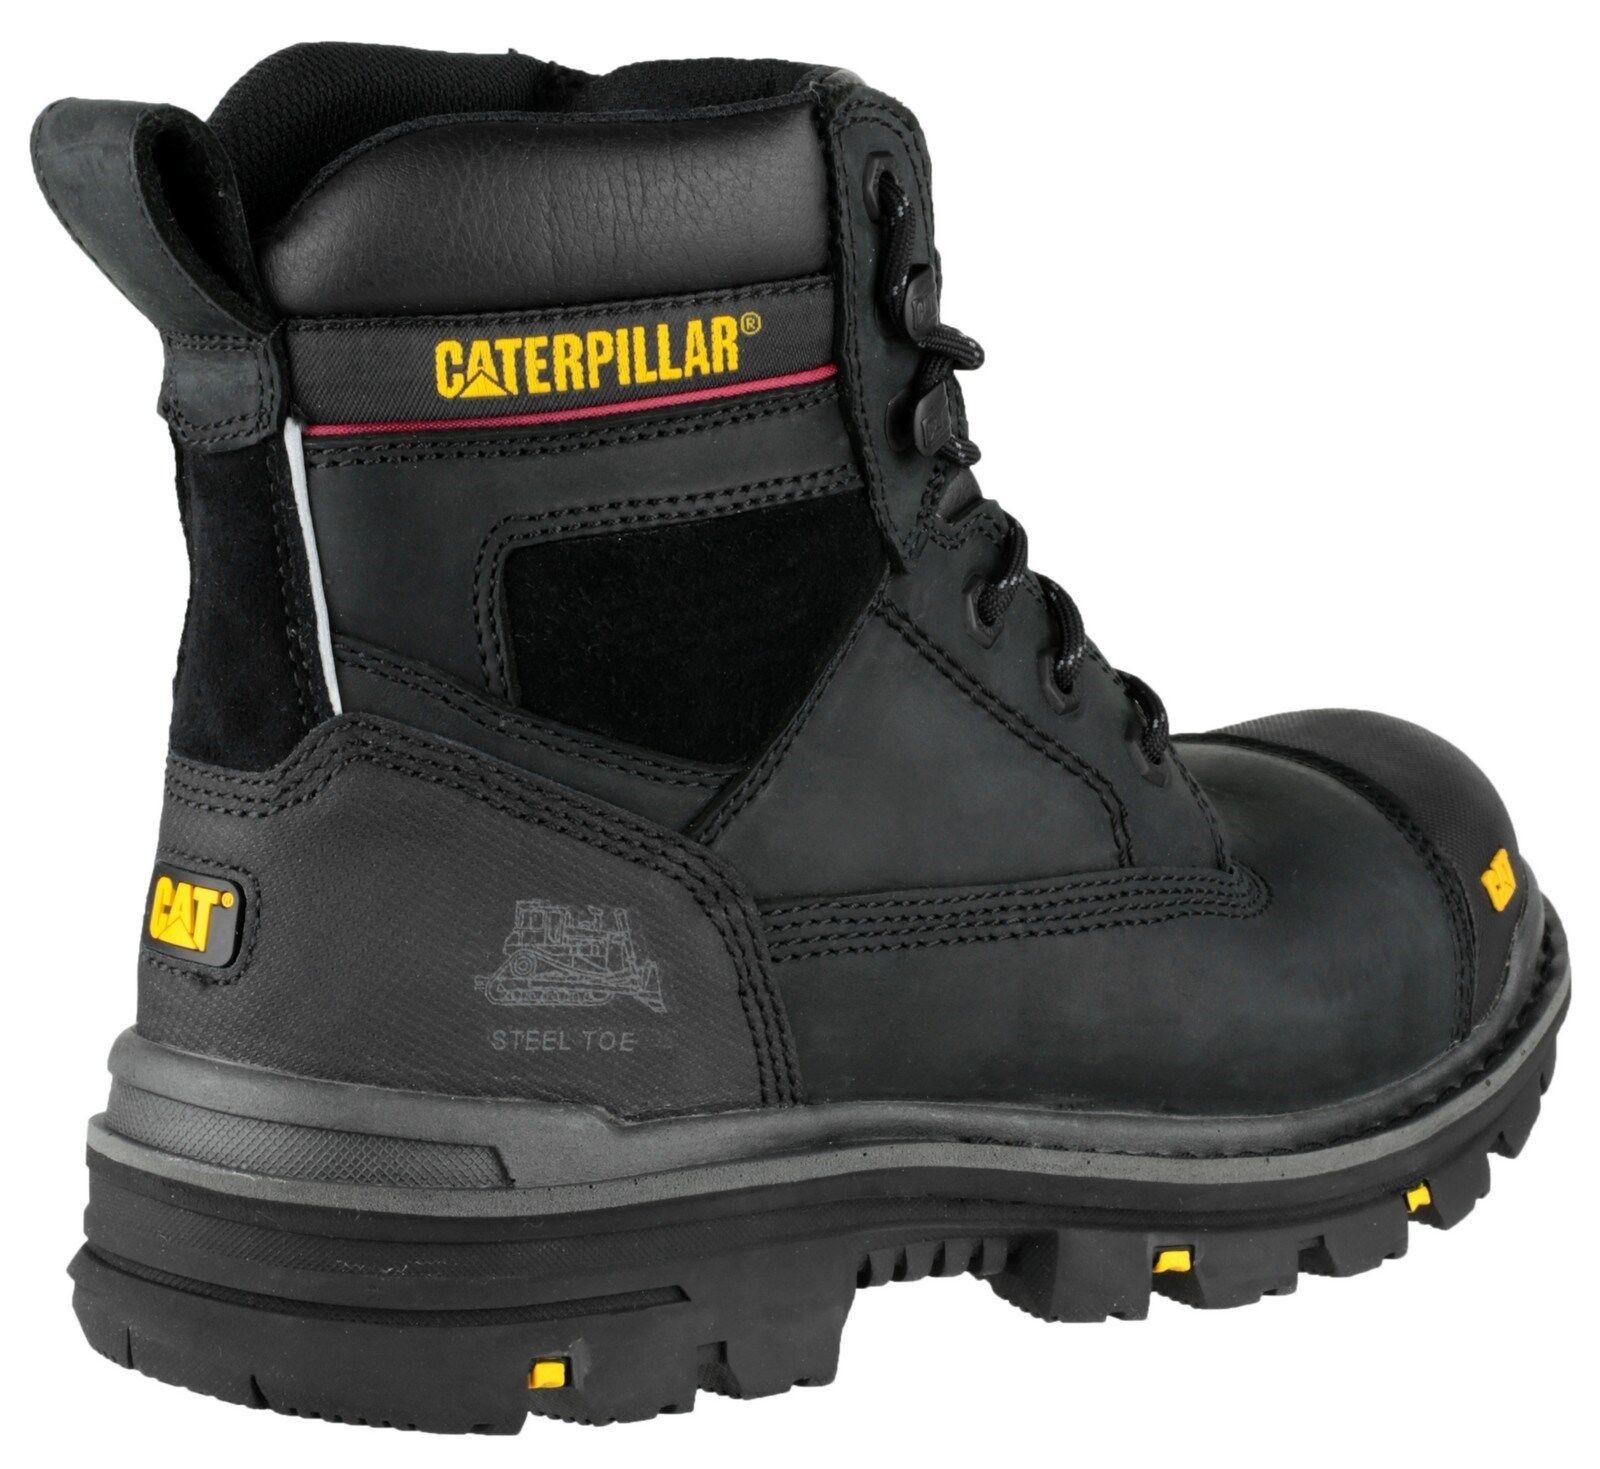 CAT Caterpillar grava 6  para hombre Bota Bota Bota Puntera De Seguridad Resistente UK6-13 5af628